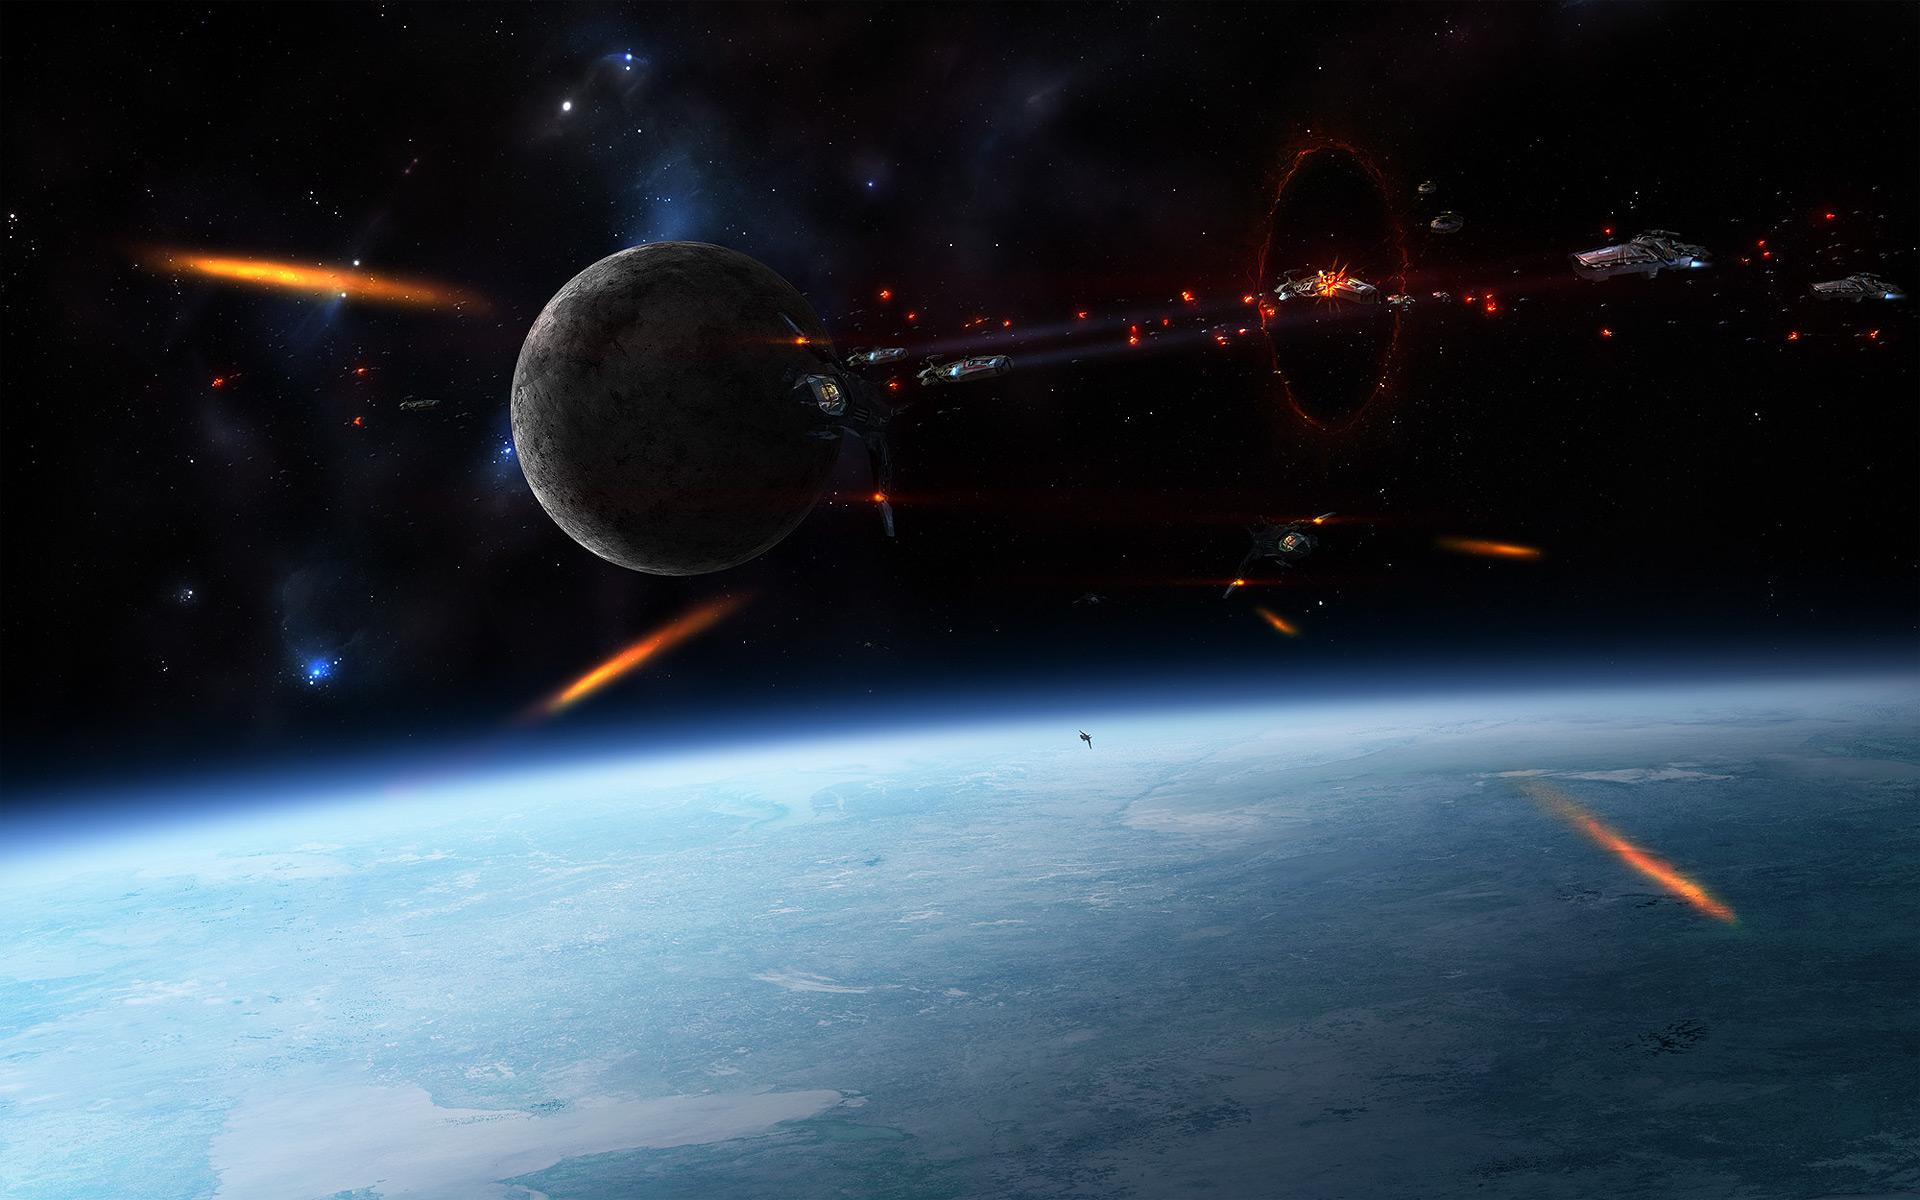 Space War collab by Krzyzowiec